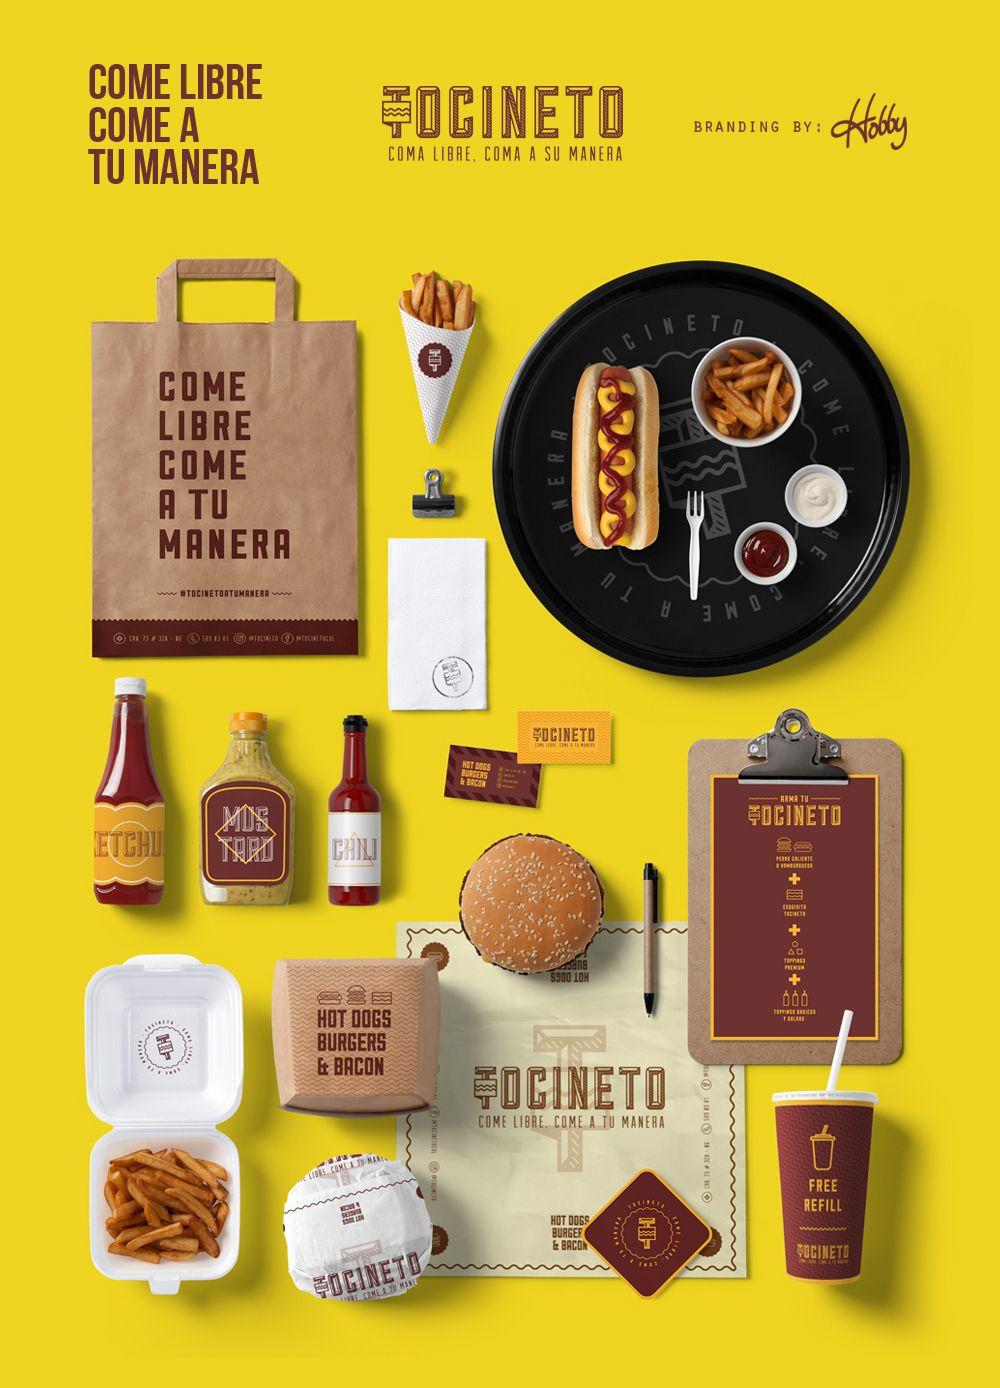 114cbb25e Tocineto • Comida Rápida (Fast food restaurant) / Desarrollo: #nombre  #eslogan #logo #papeleria #bolsa #menu #papeldeenvoltura